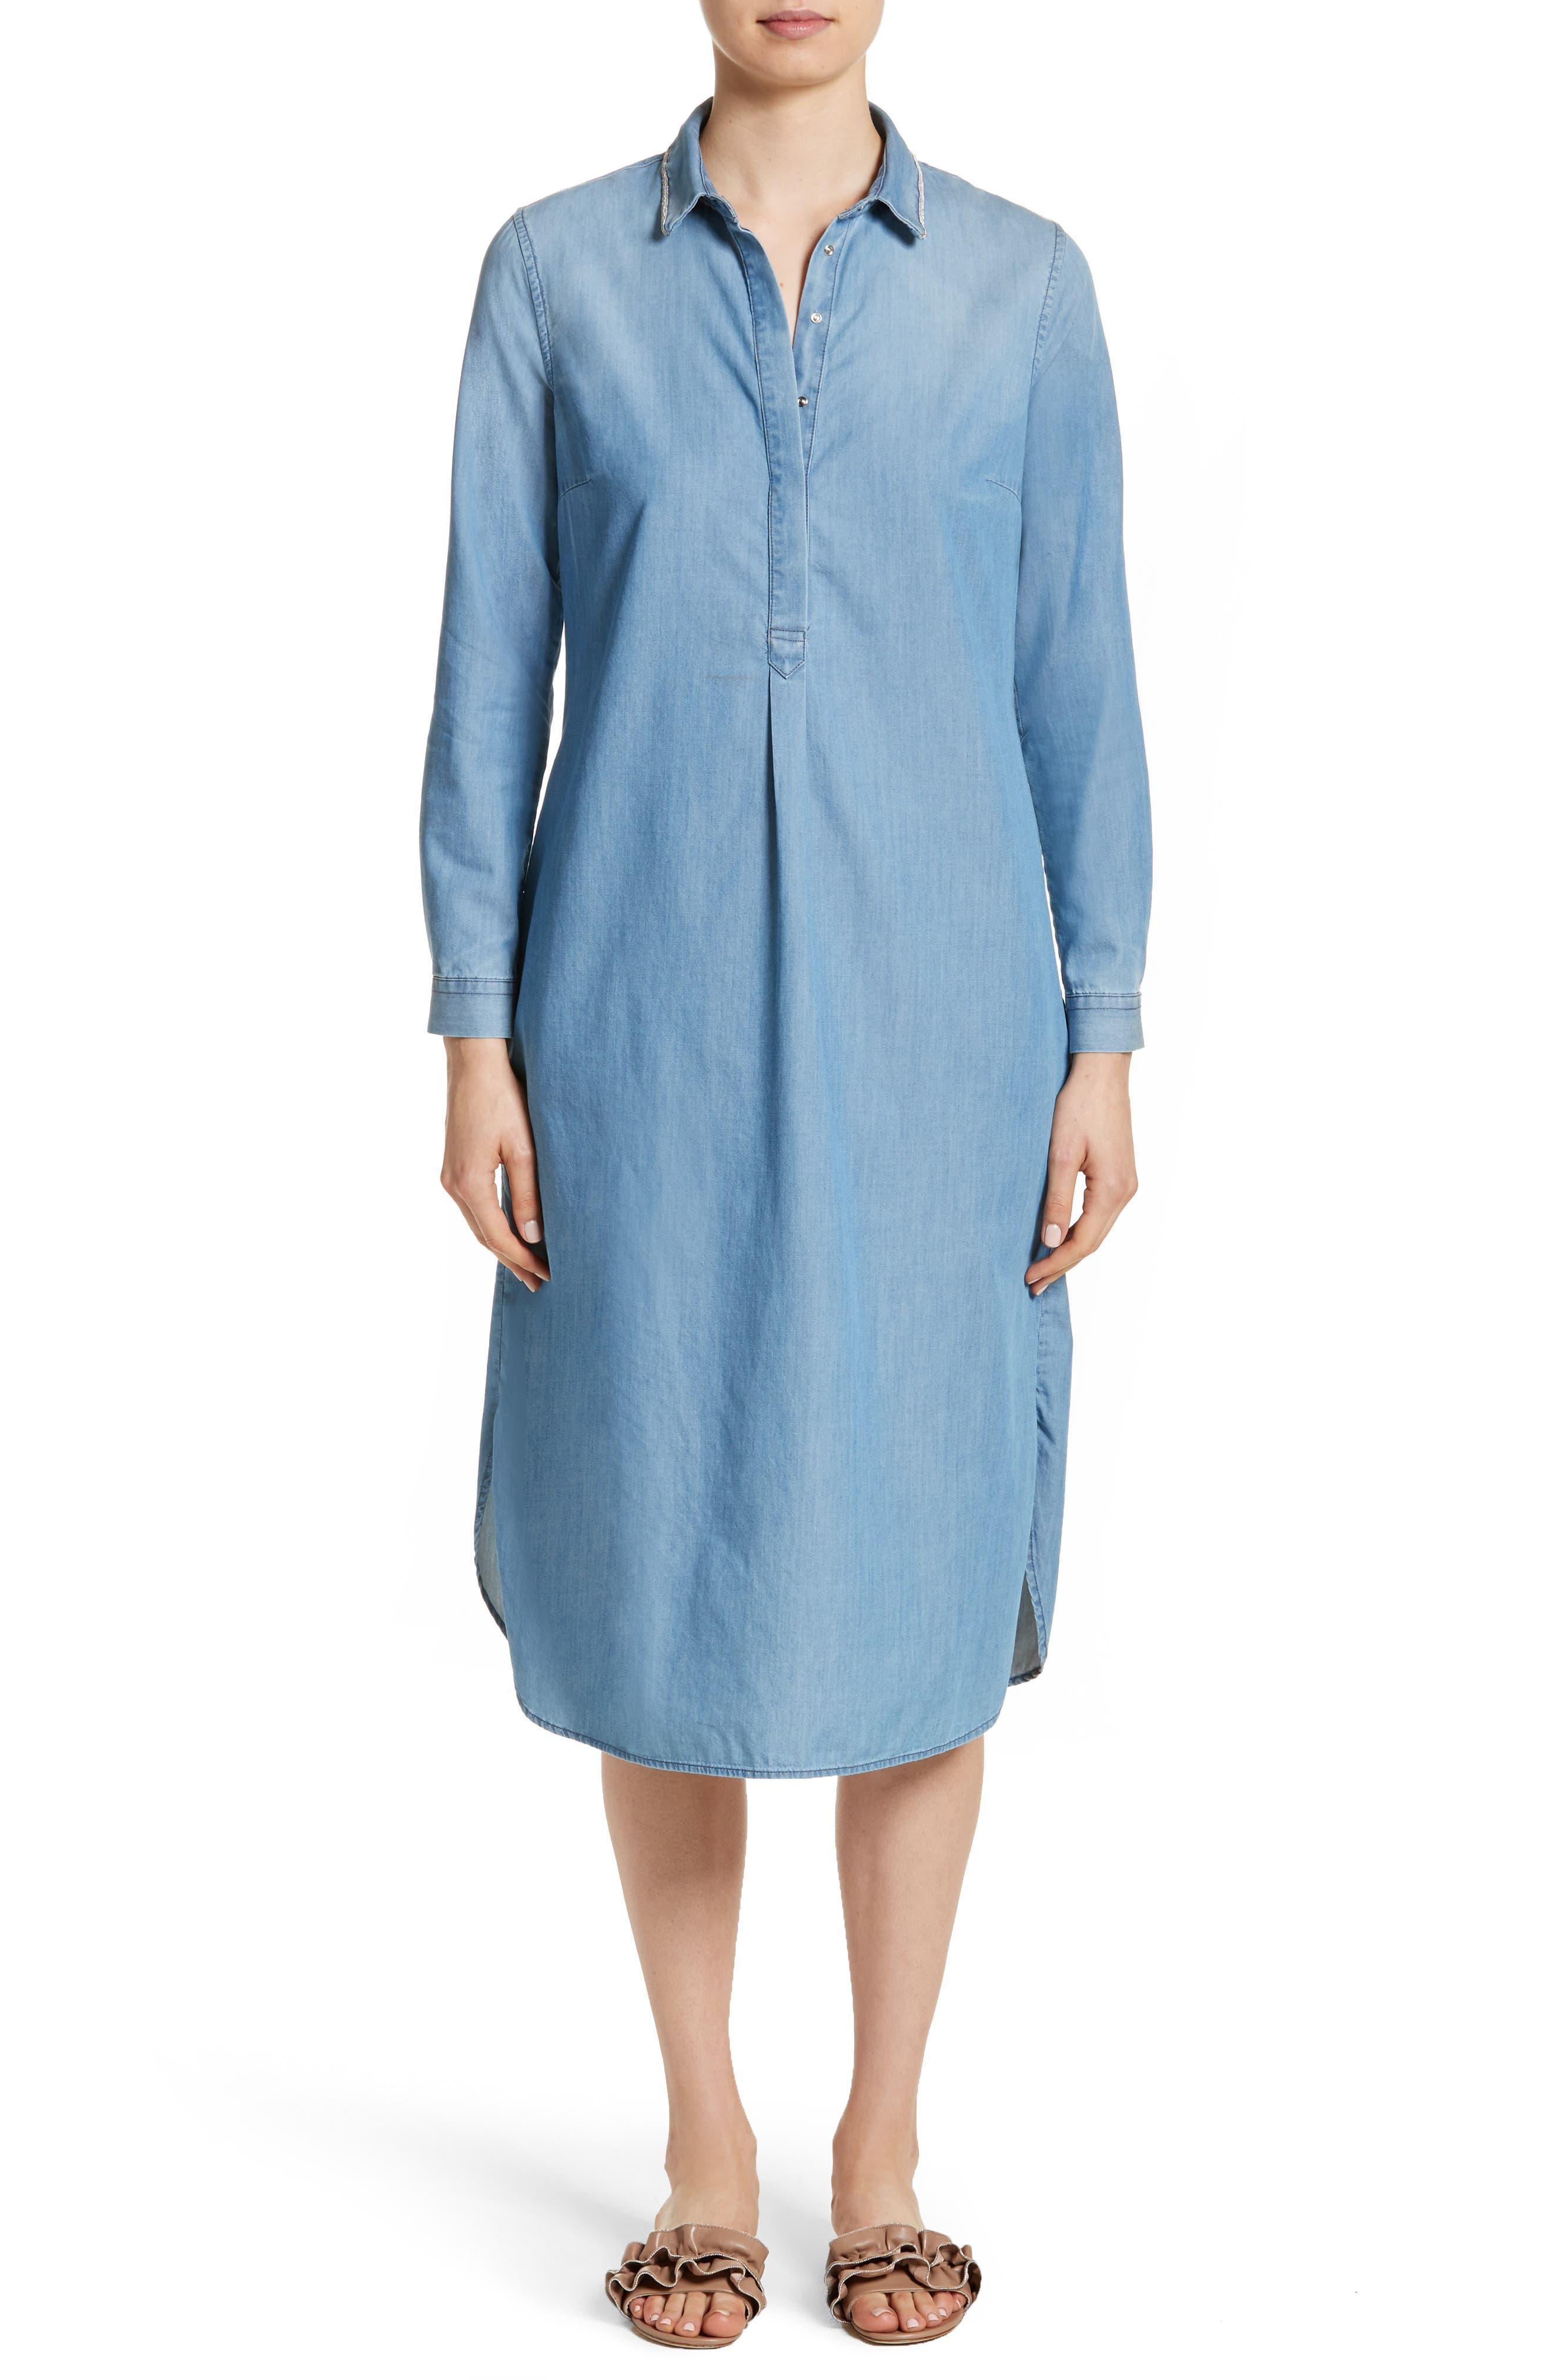 Cotton & Cashmere Chambray Shirtdress,                         Main,                         color, Denim Blue